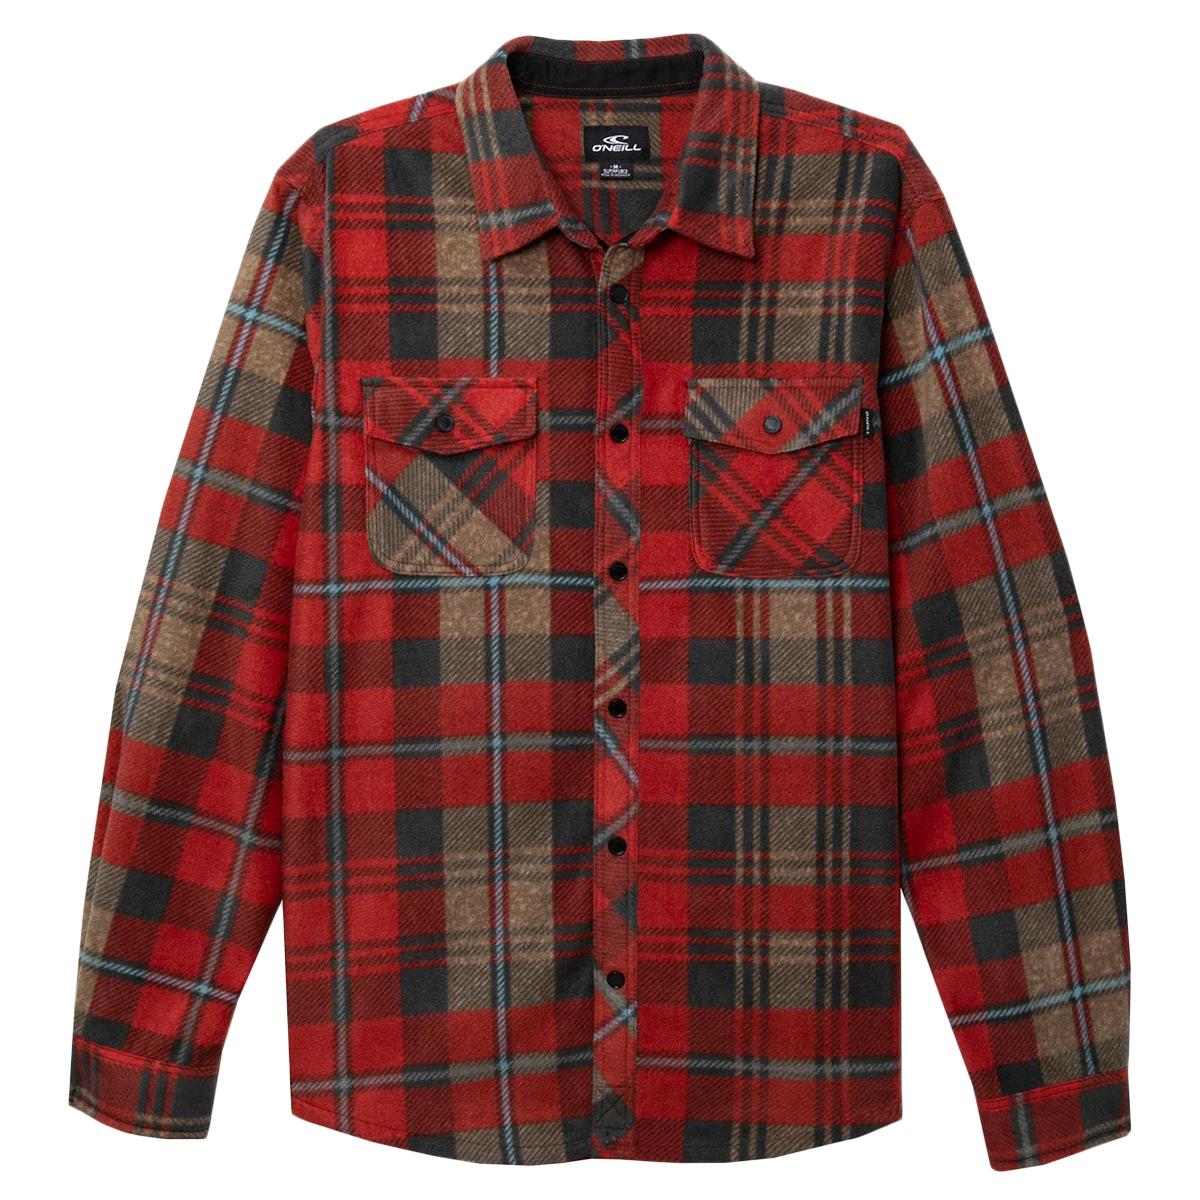 O'neill Men's Glacier Plaid Long-Sleeve Shirt - Red, S